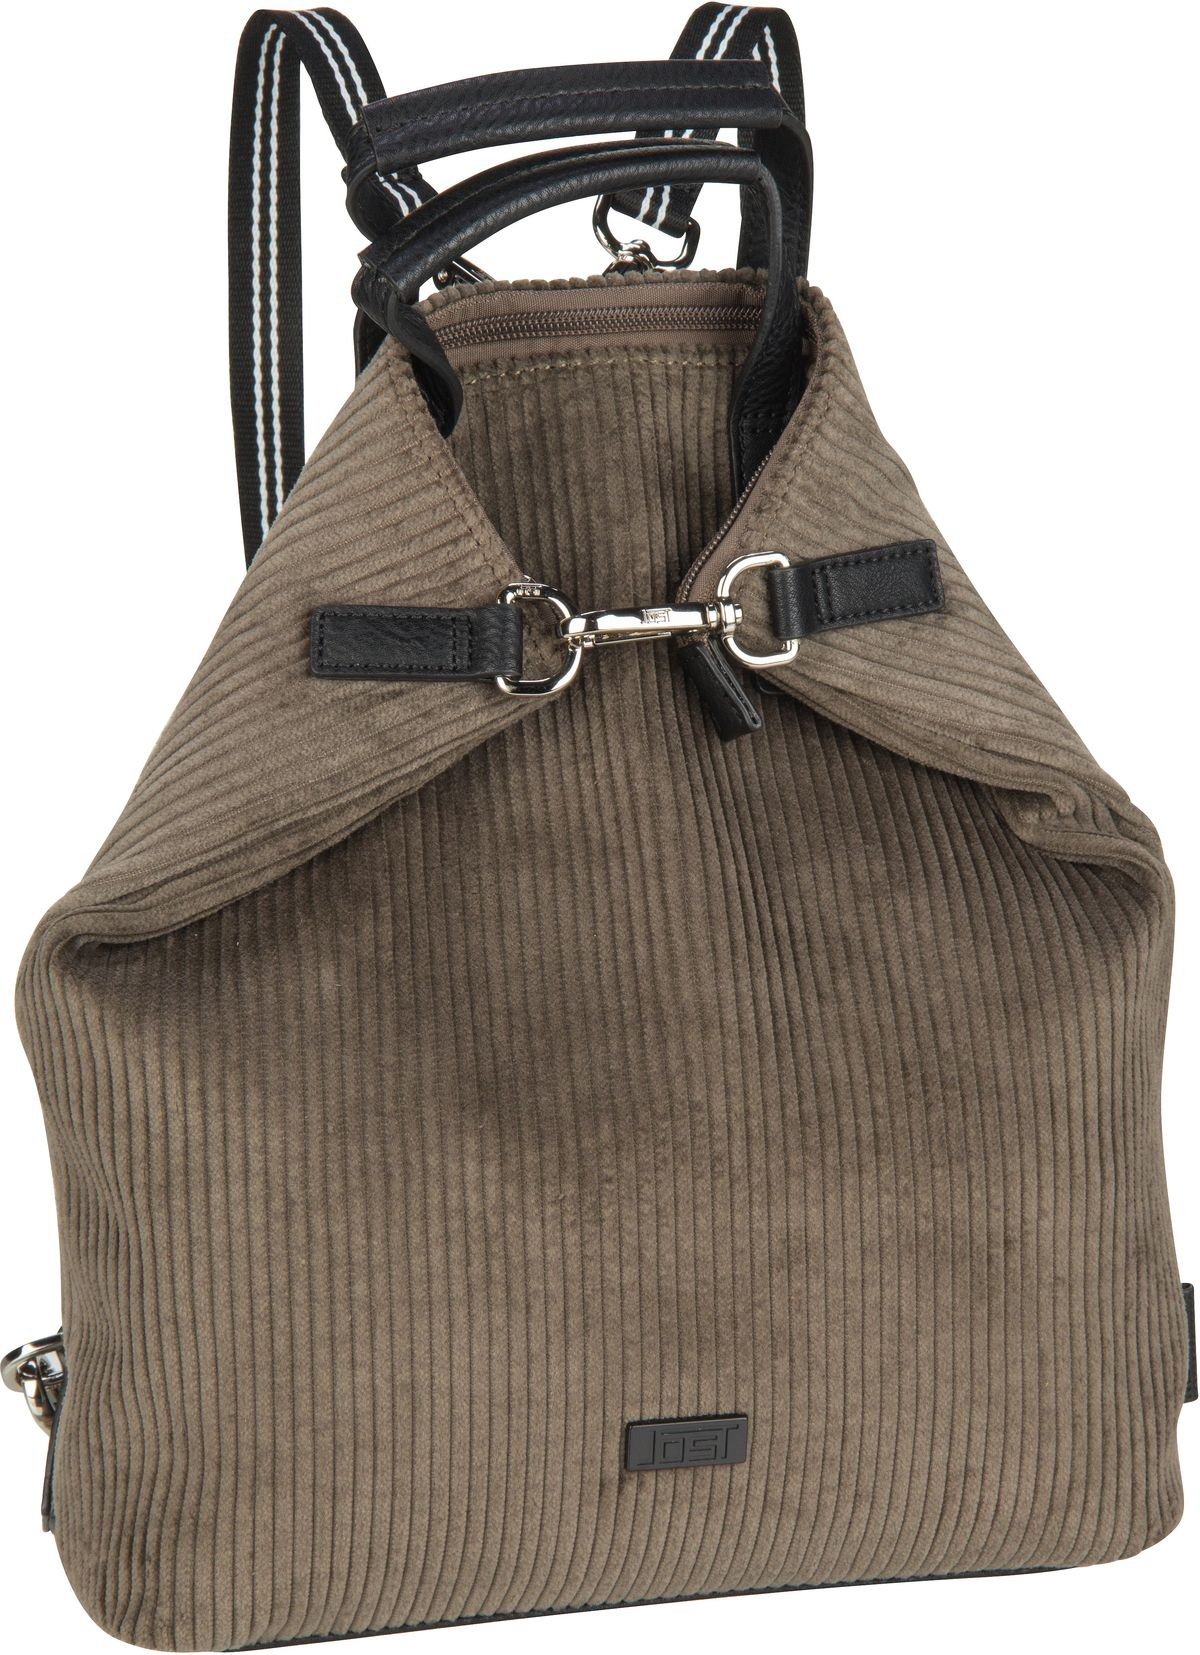 Rucksack / Daypack Cord 7944 X-Change Bag XS Olive